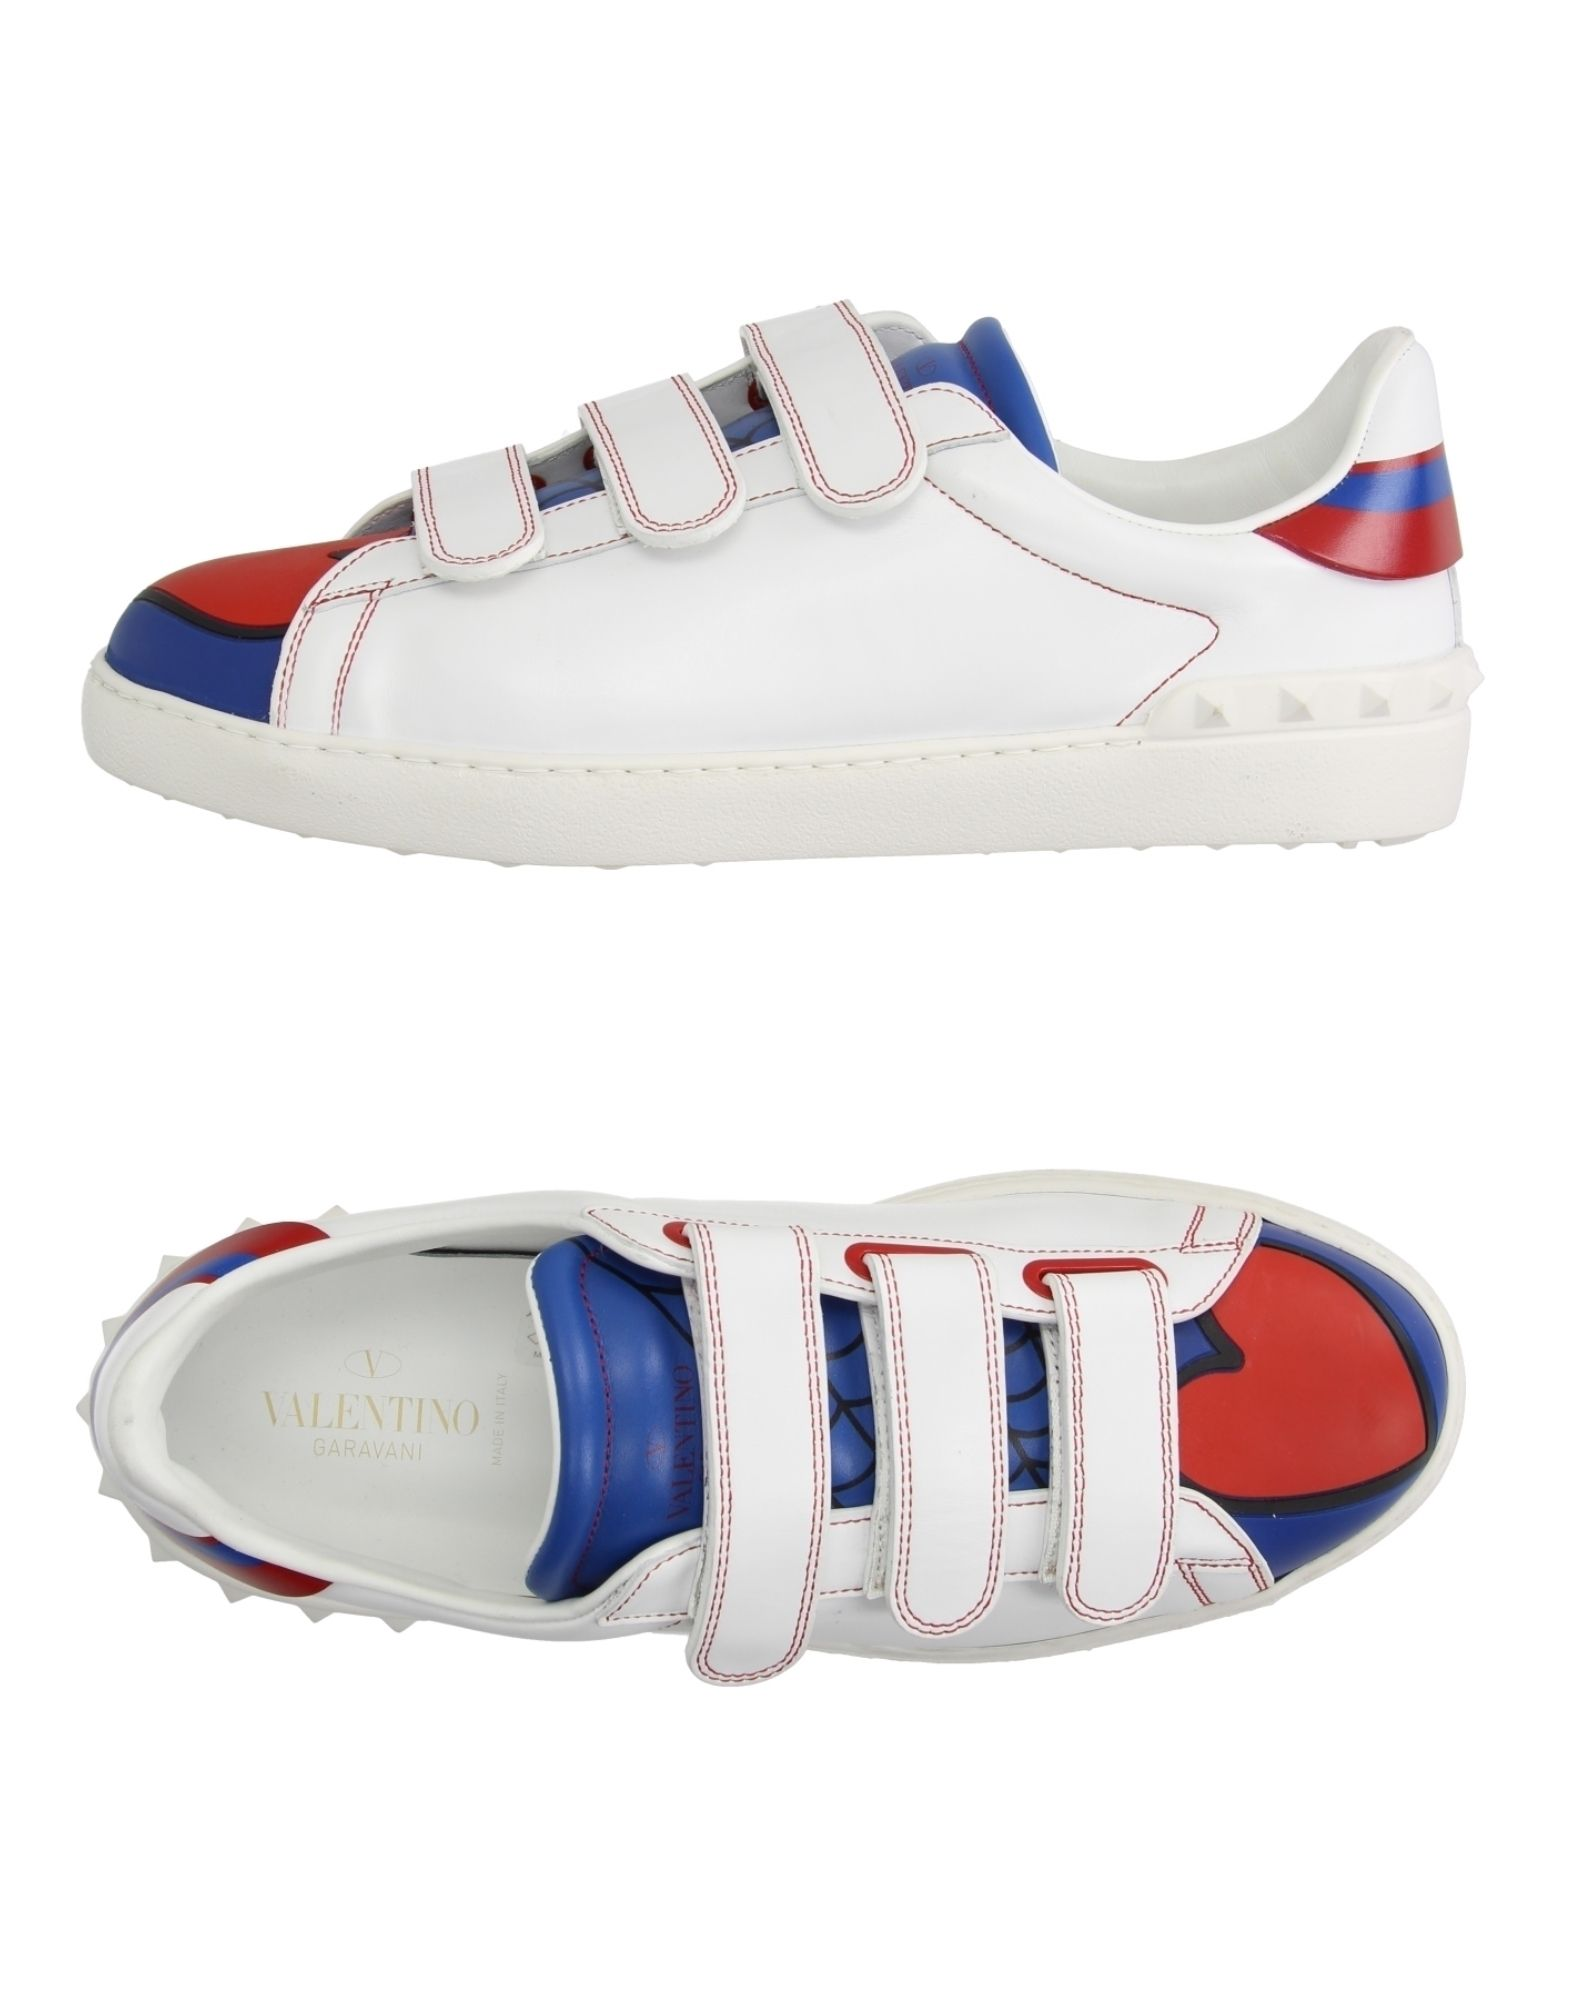 Valentino Garavani Sneakers Herren  11189744LW Gute Qualität beliebte Schuhe